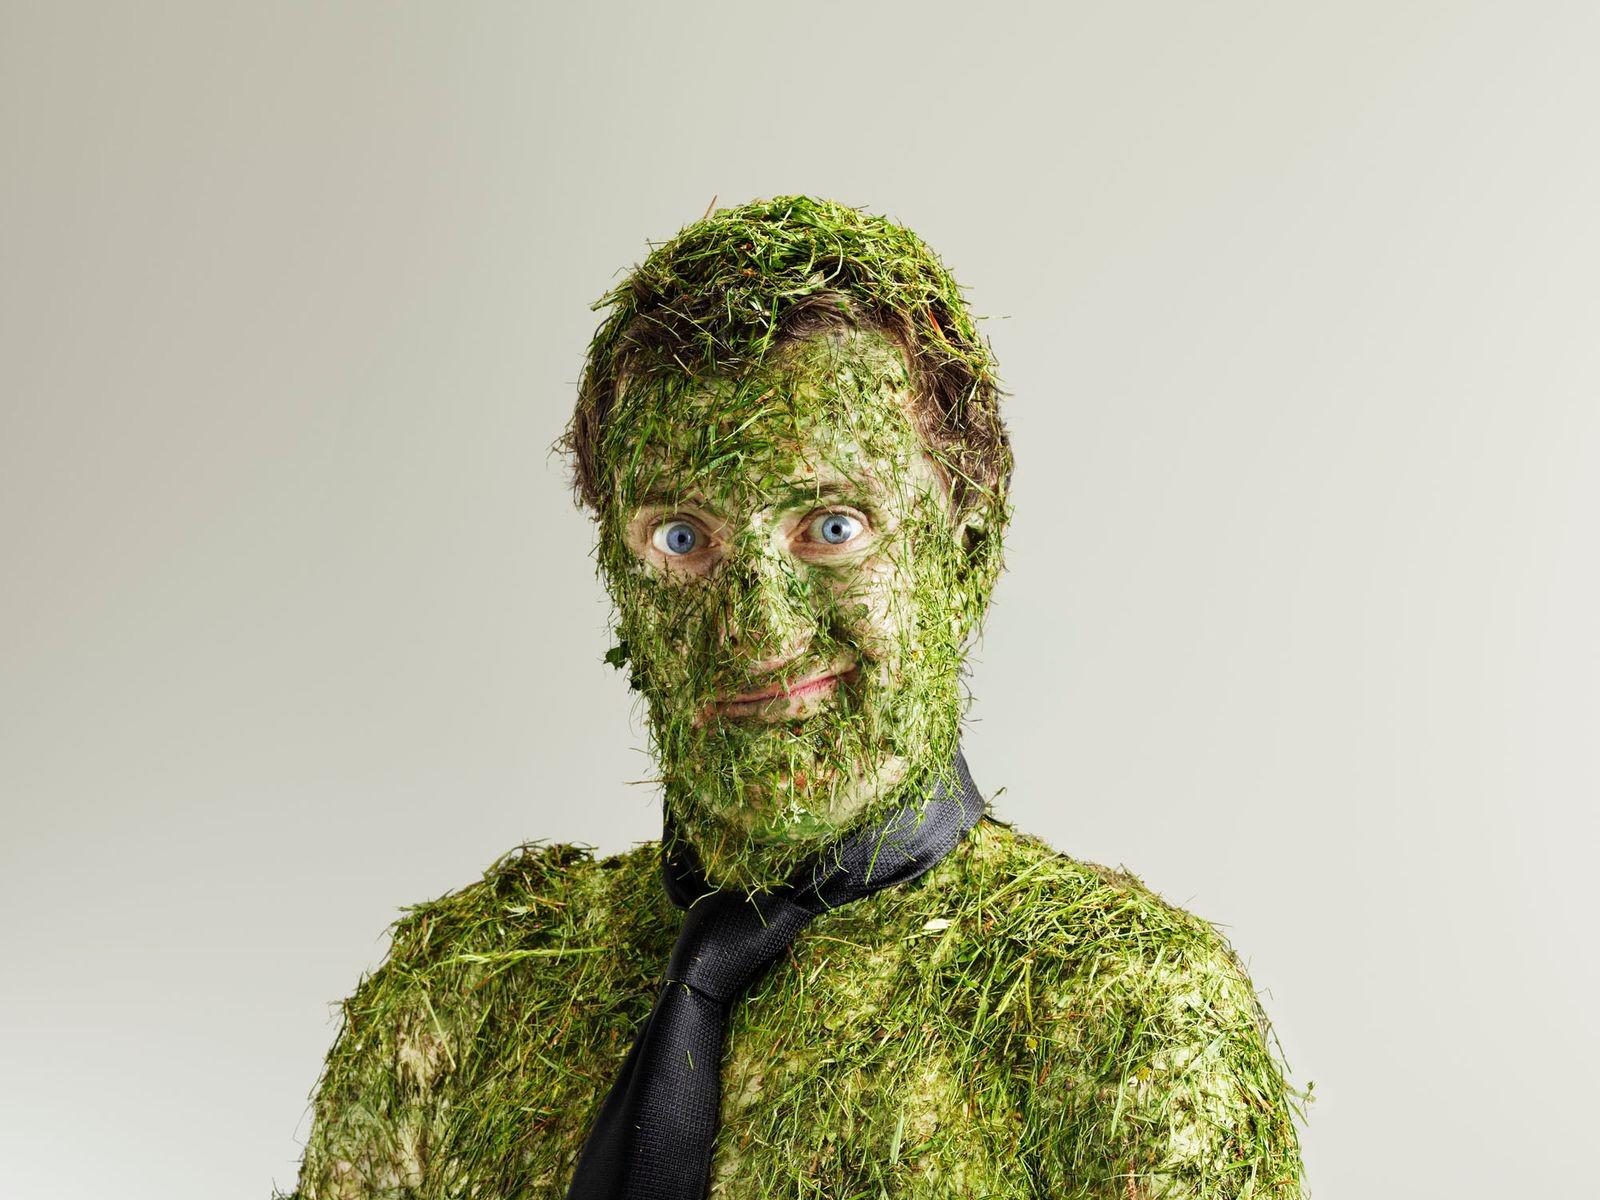 мужик, трава, работа